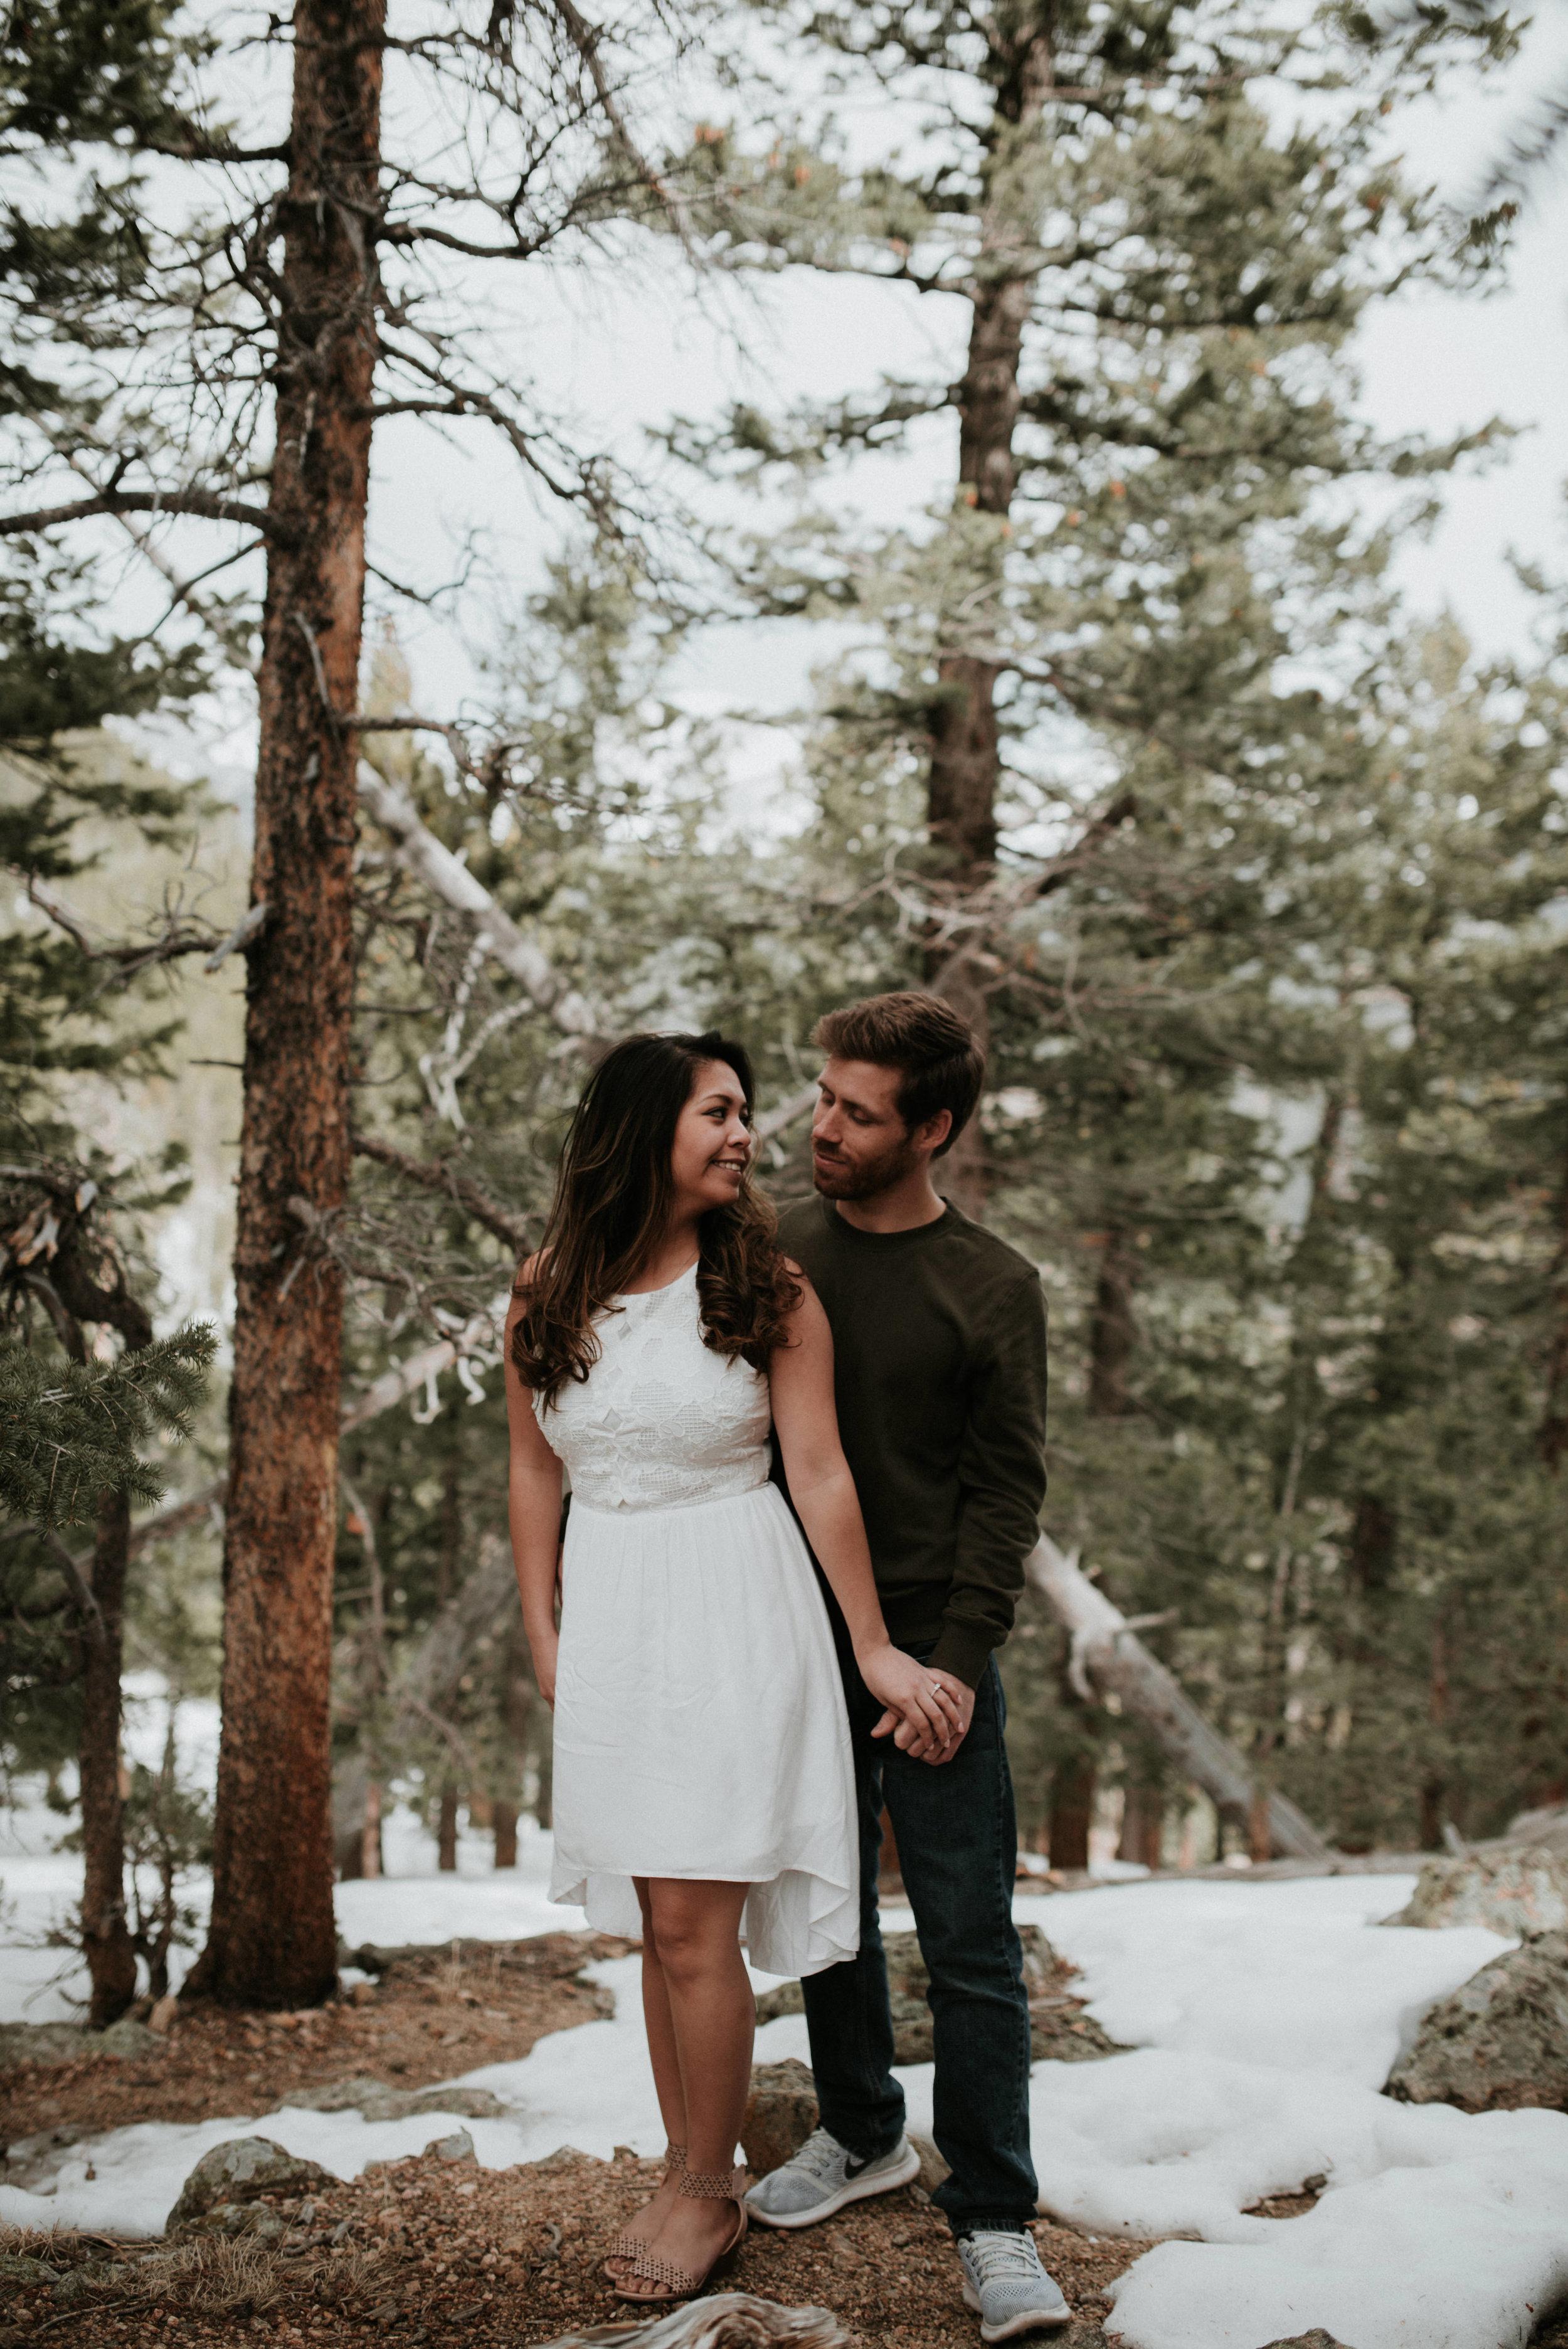 Zach&Rosalie Rocky Mountain National Park Engagement Denver Colorado Rocky Mountain Wedding Photographer00024.jpg